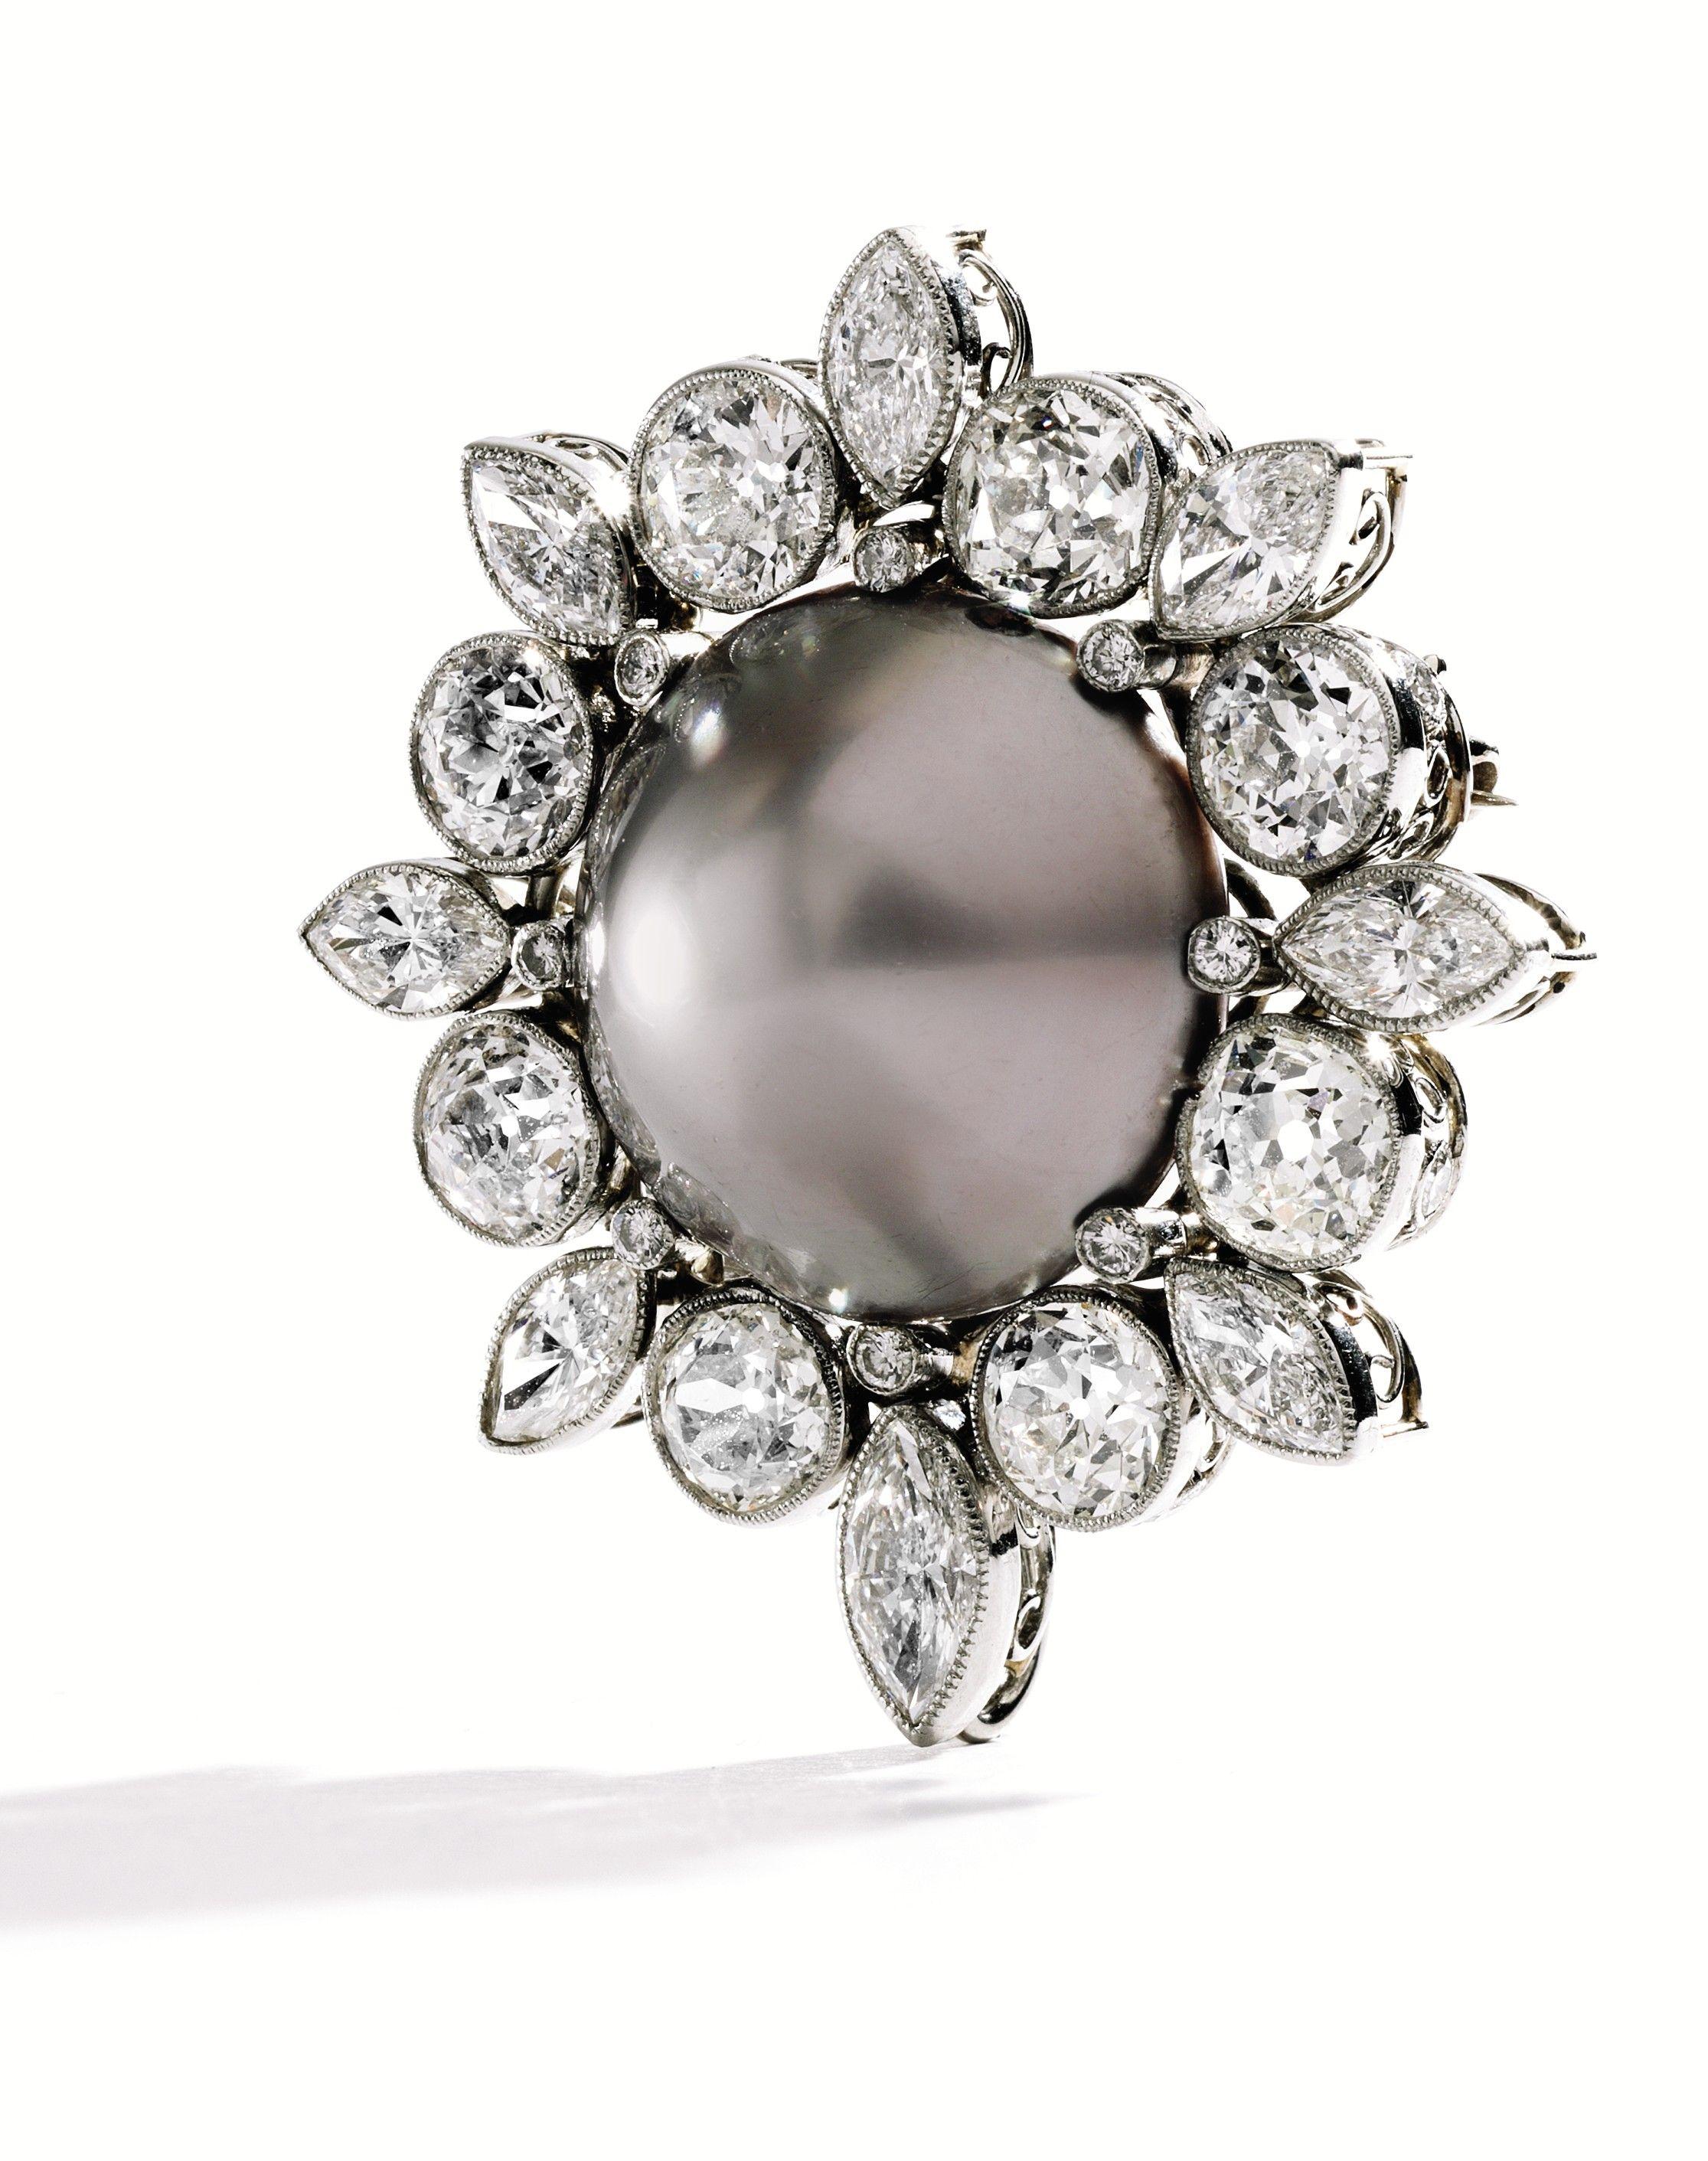 Diamond, natural pearl, brooch